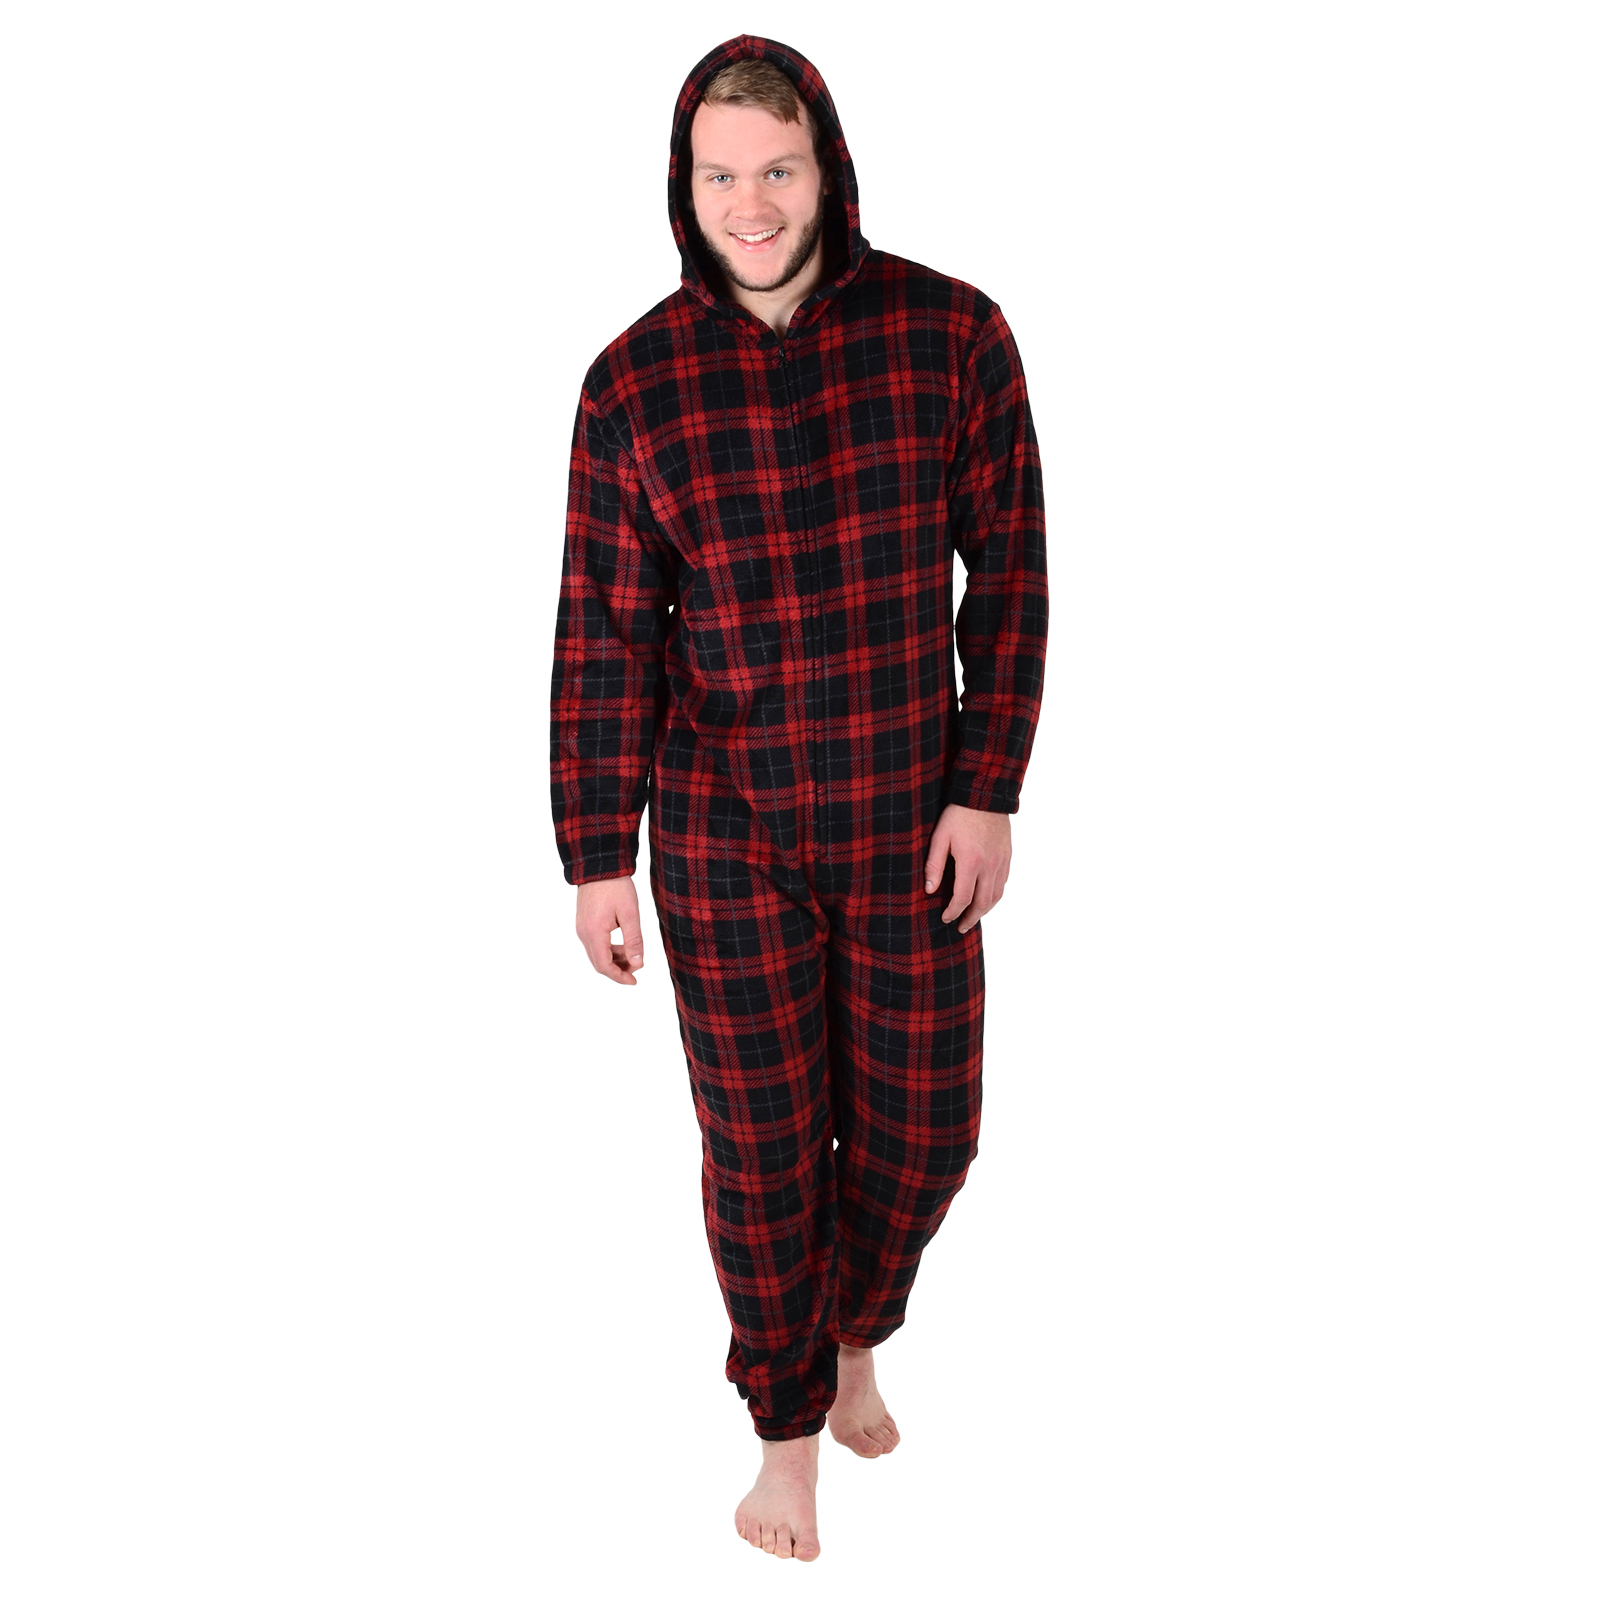 mens cosy fleece all in one piece pyjamas jump sleep suit pjs nightwear new ebay. Black Bedroom Furniture Sets. Home Design Ideas